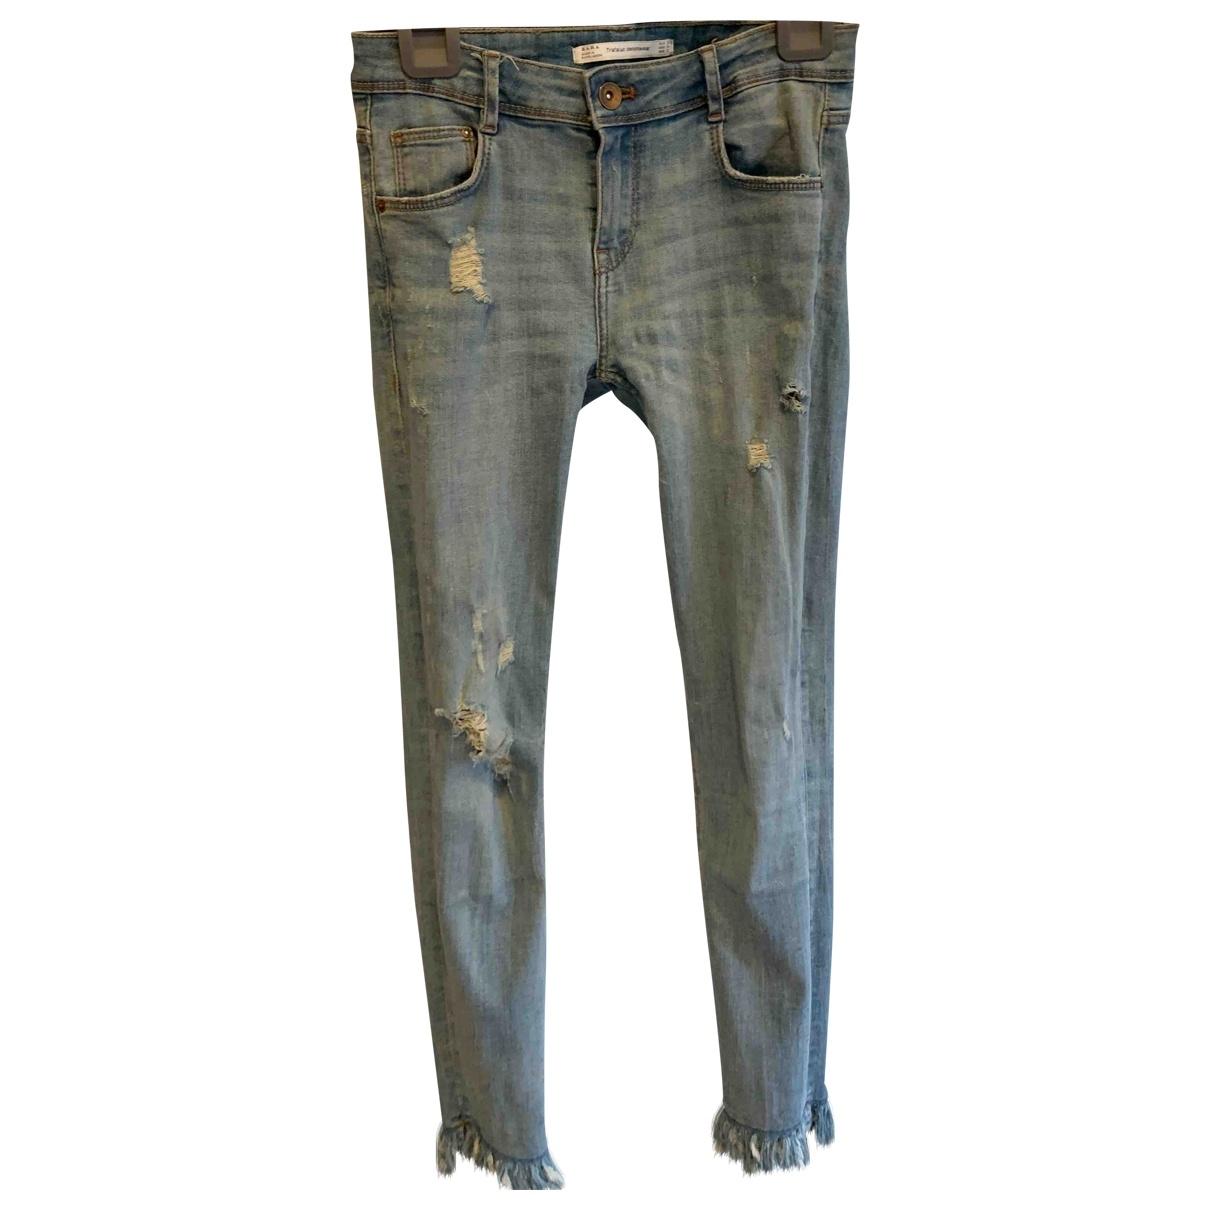 Zara \N Blue Denim - Jeans Jeans for Women 36 FR